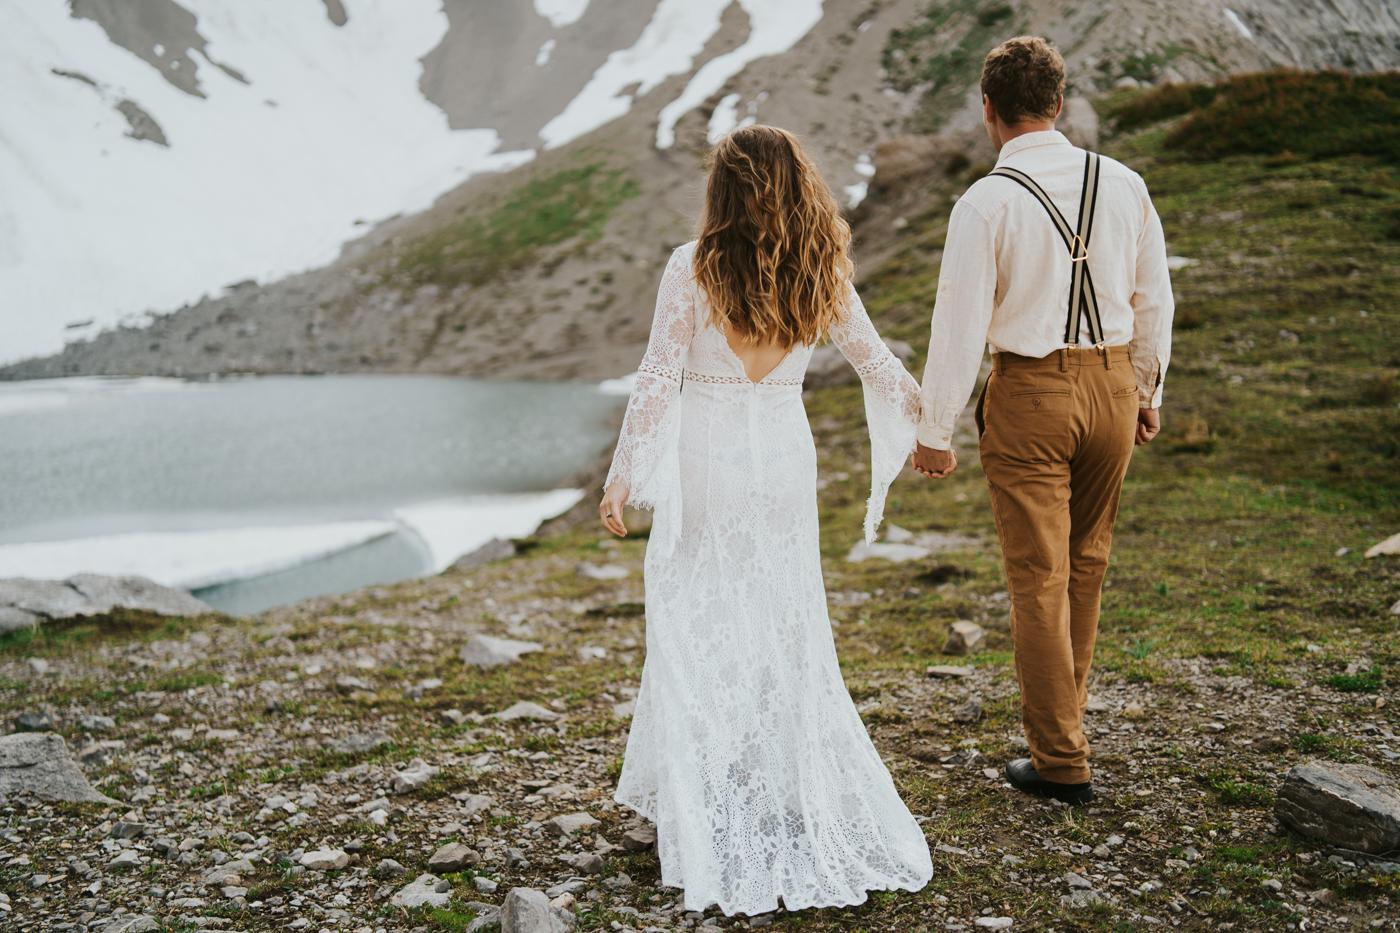 tyraephotography_photographer_wedding_elopement_engagement_photography-07547.jpg